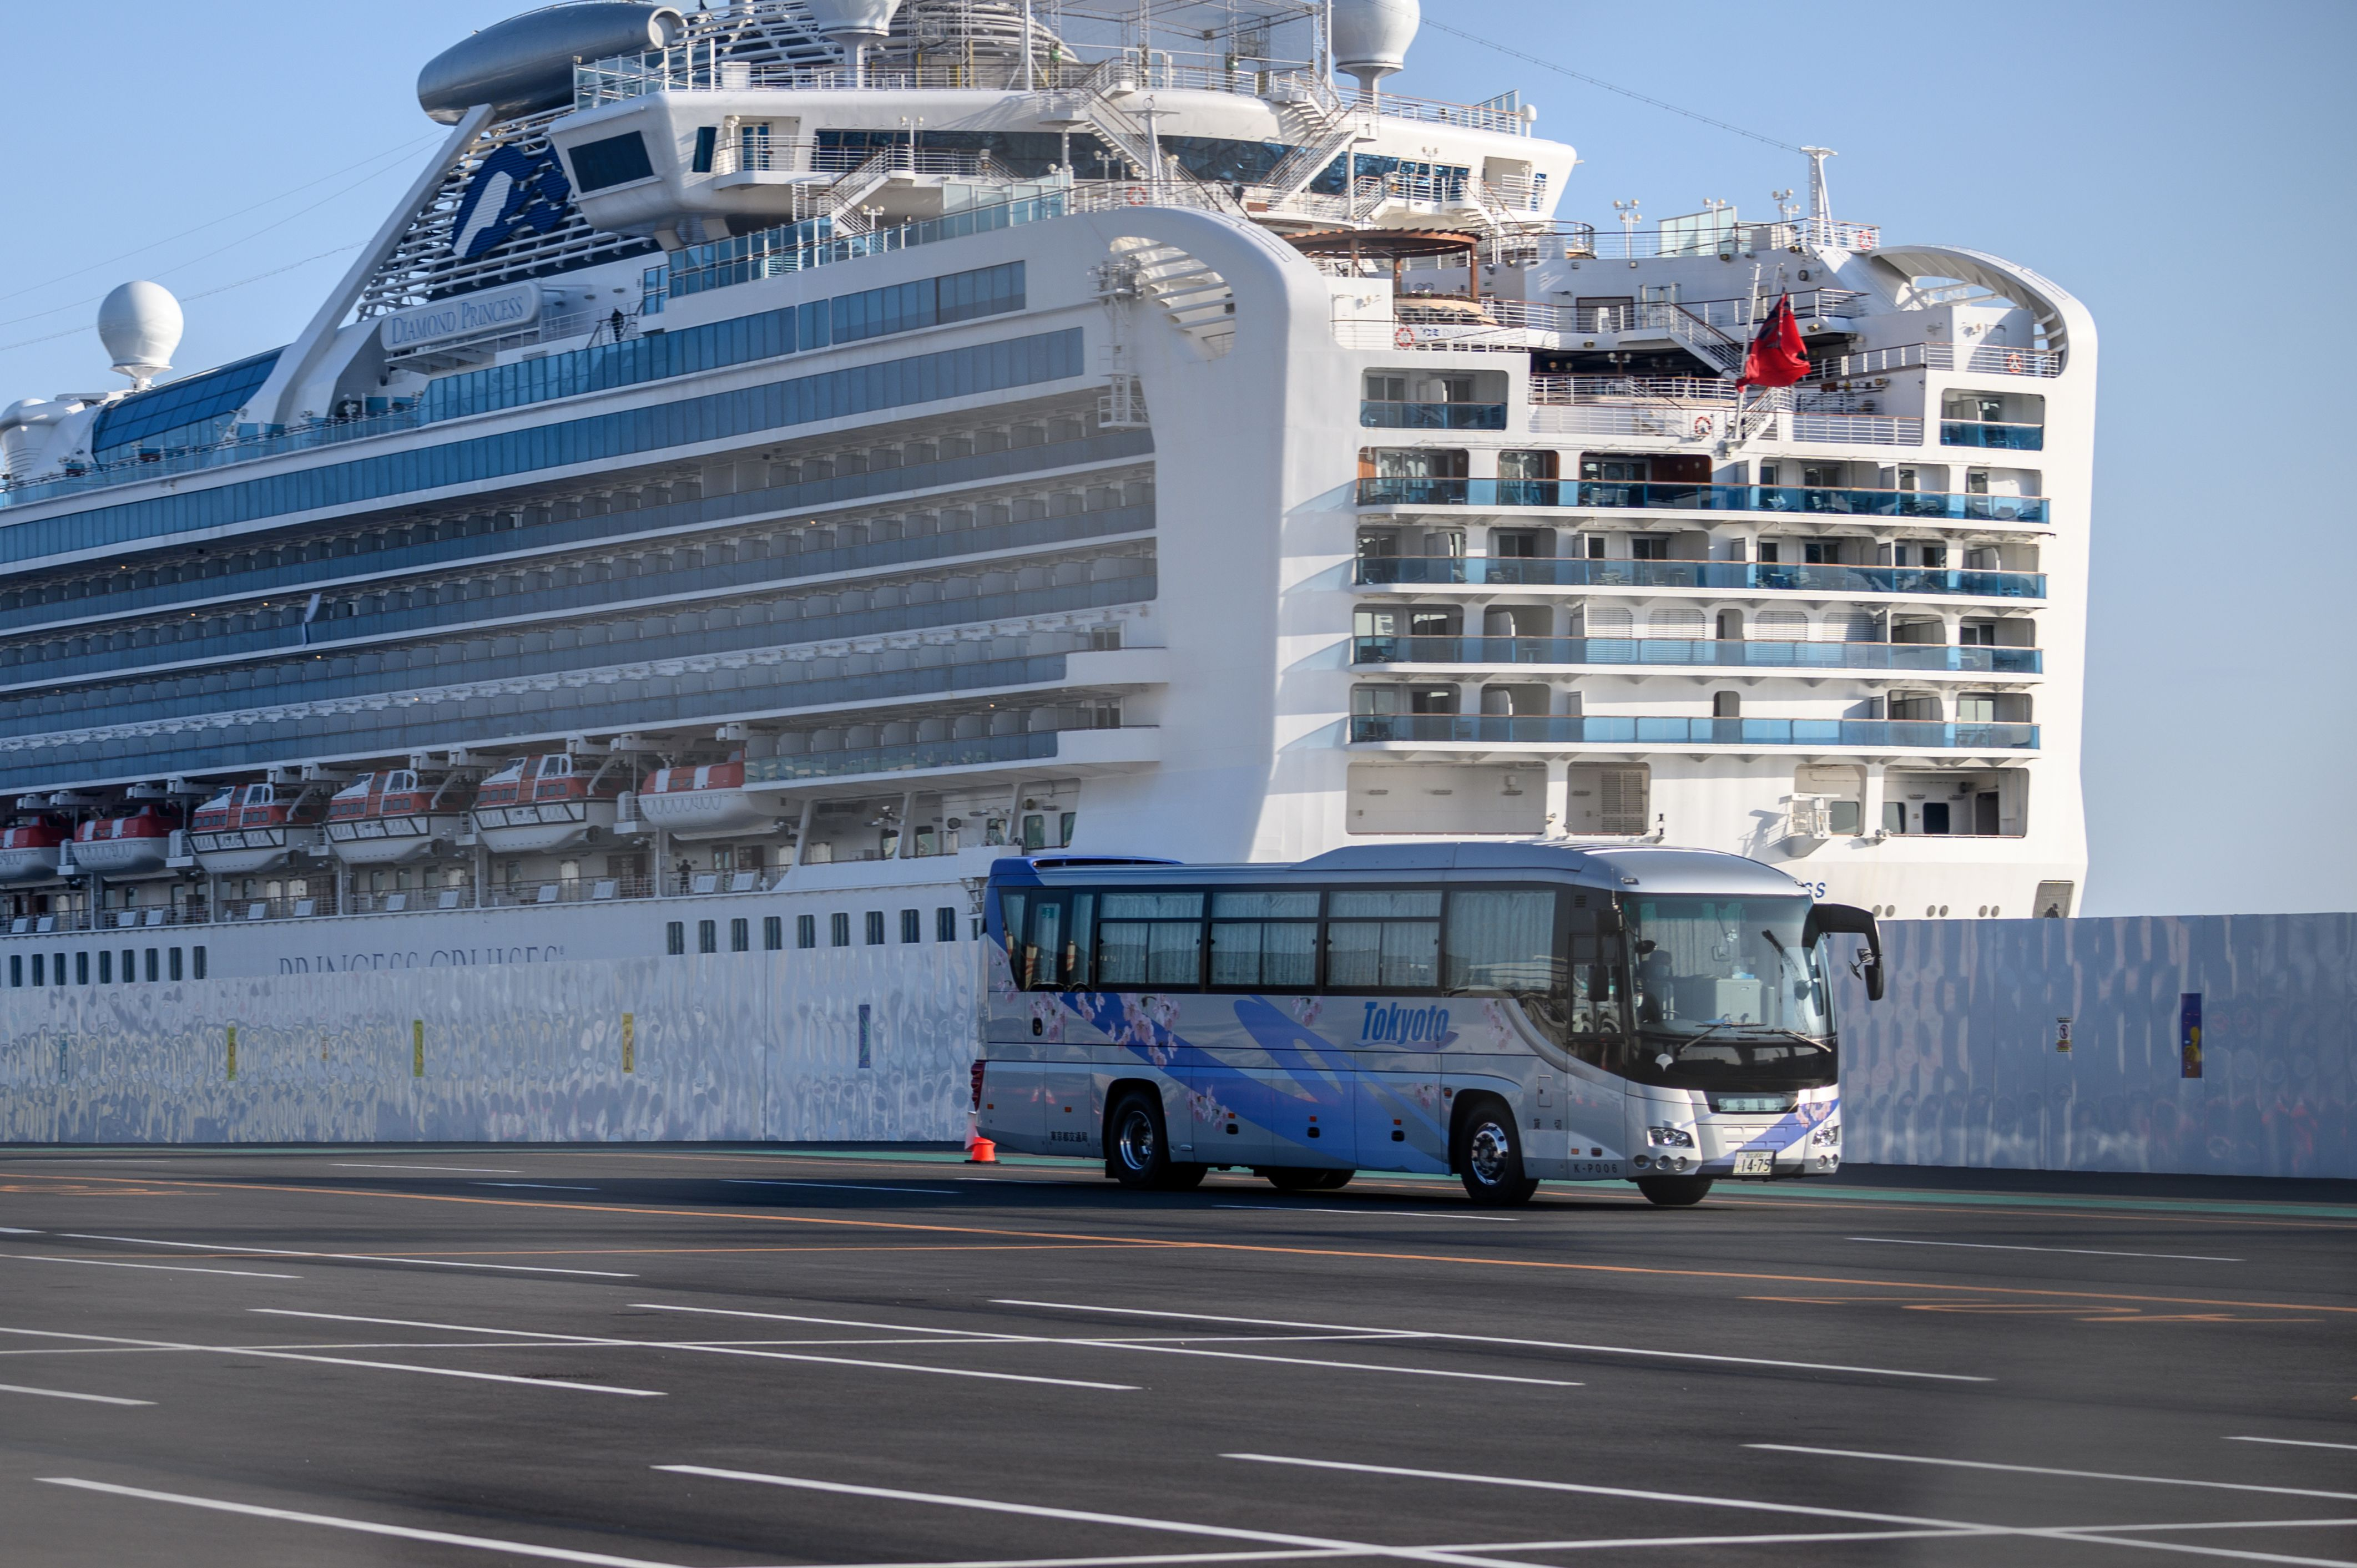 The Diamond Princess cruise ship, in quarantine due to fears of COVID-19, at Daikoku pier cruise terminal in Yokohama.